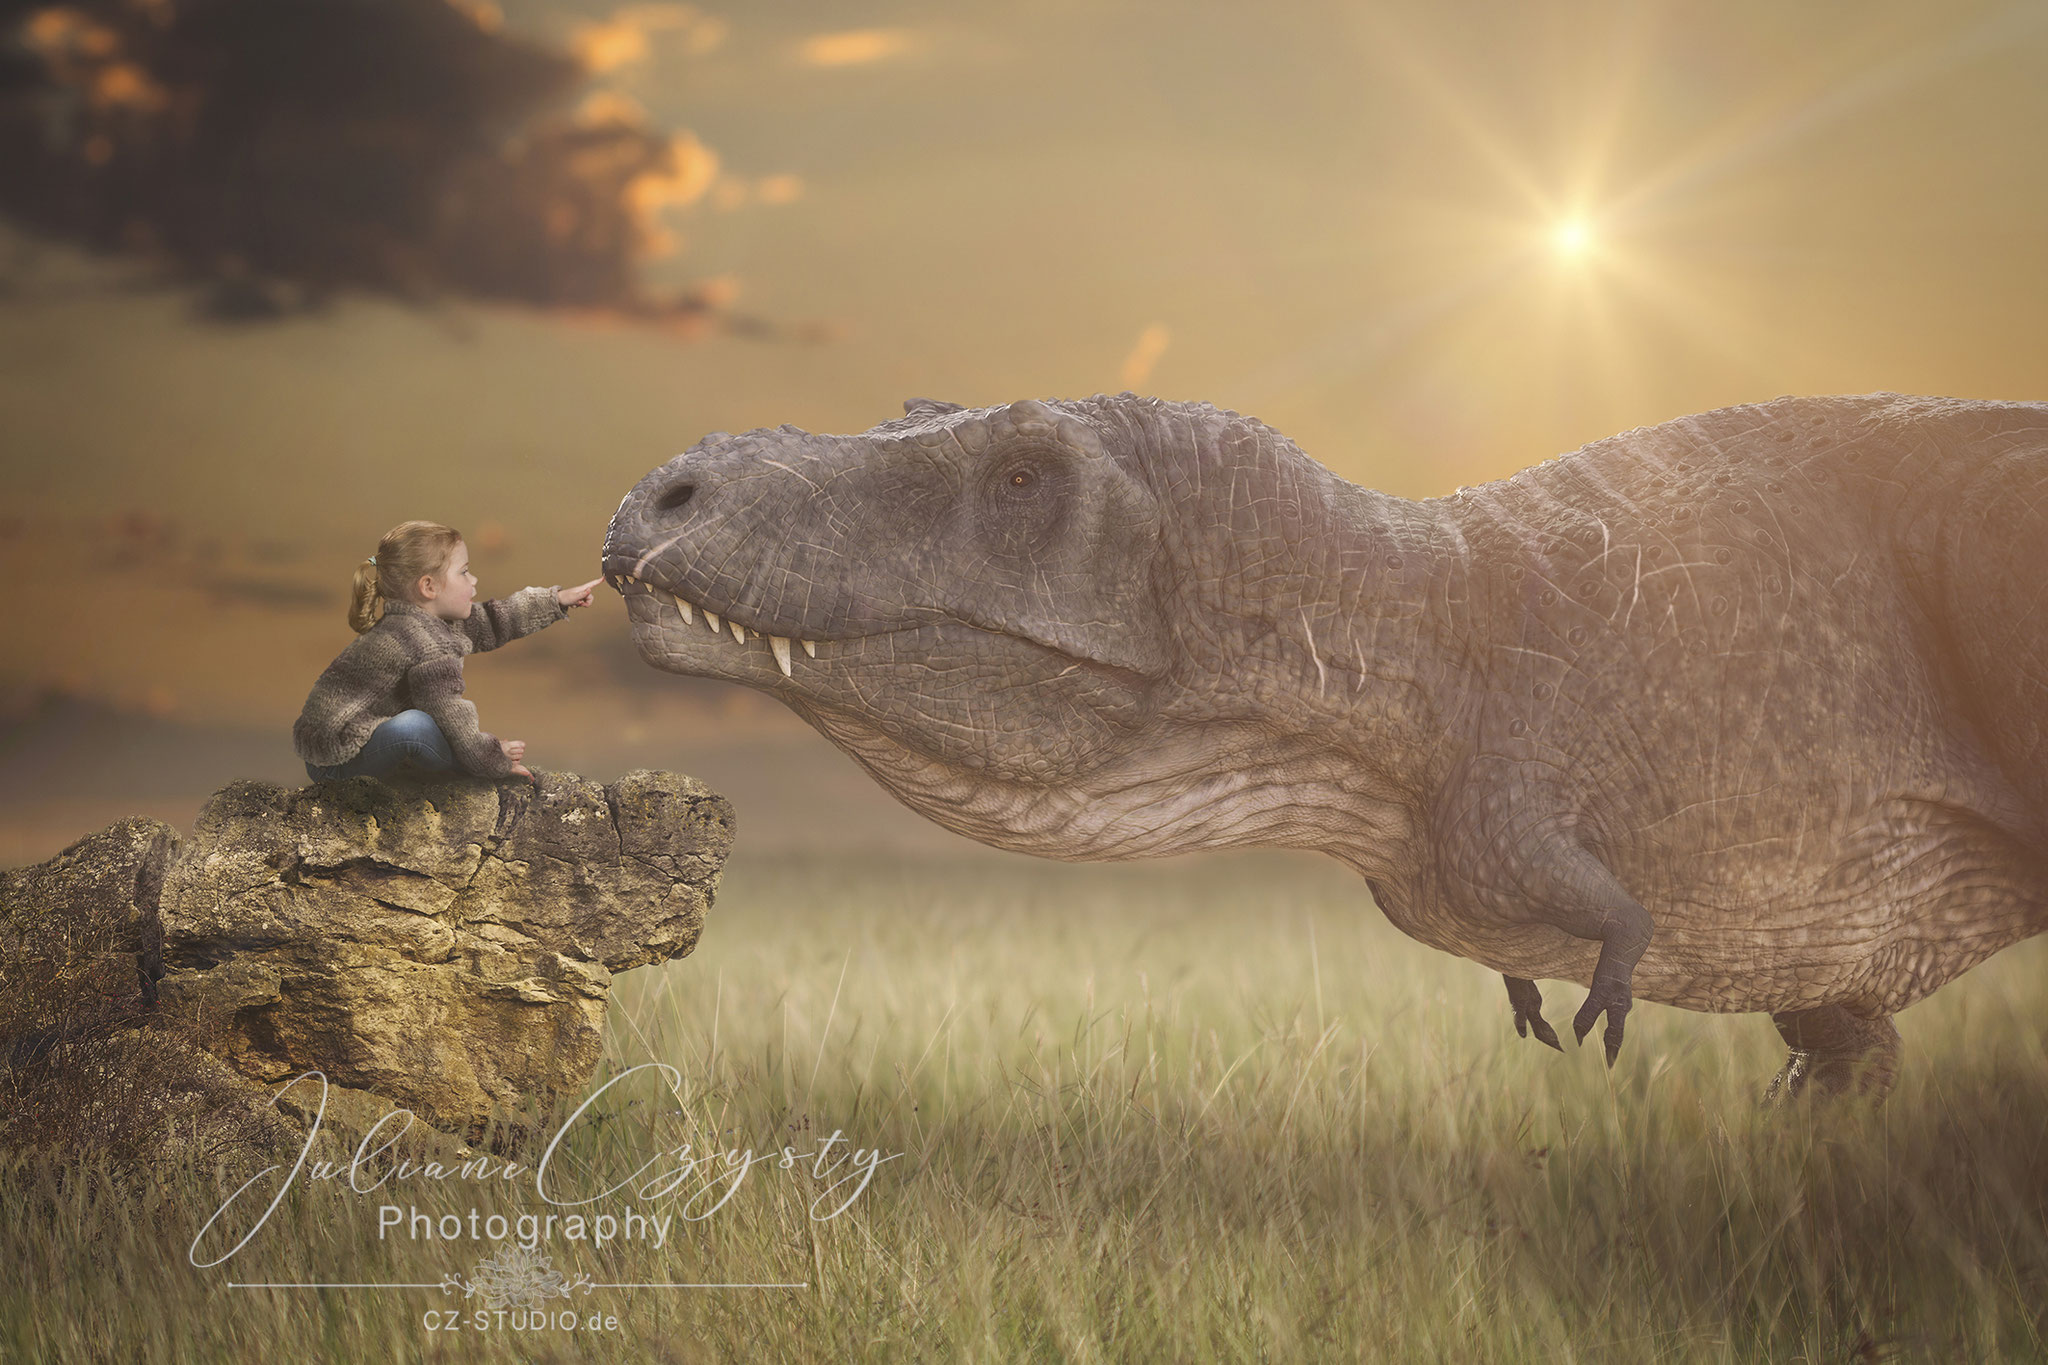 Special Shooting T-Rex Touch für jeden Dinosaurier Fan - aufwendiges Composing